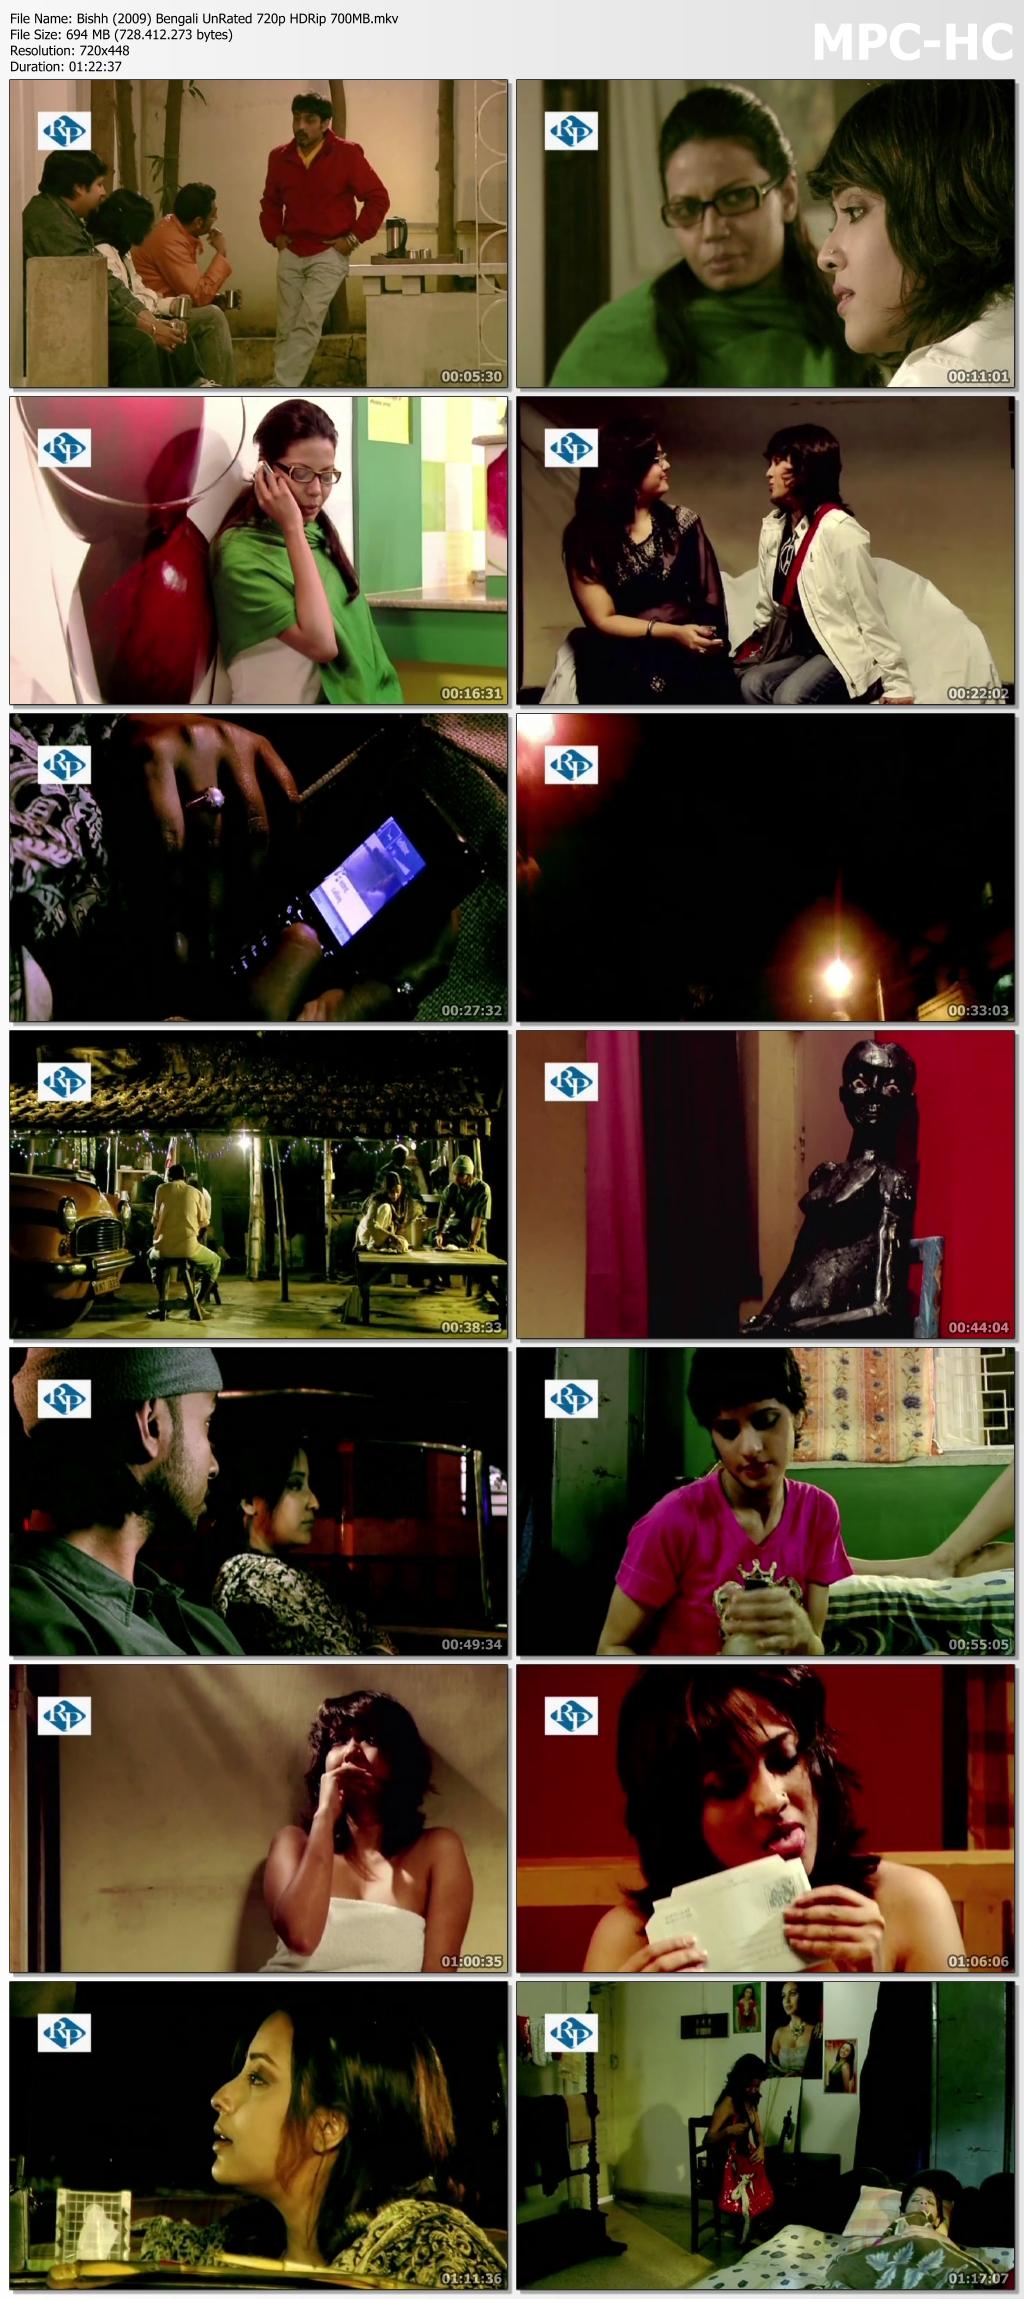 Bishh-2009-Bengali-Un-Rated-720p-HDRip-700-MB-mkv-thumbs